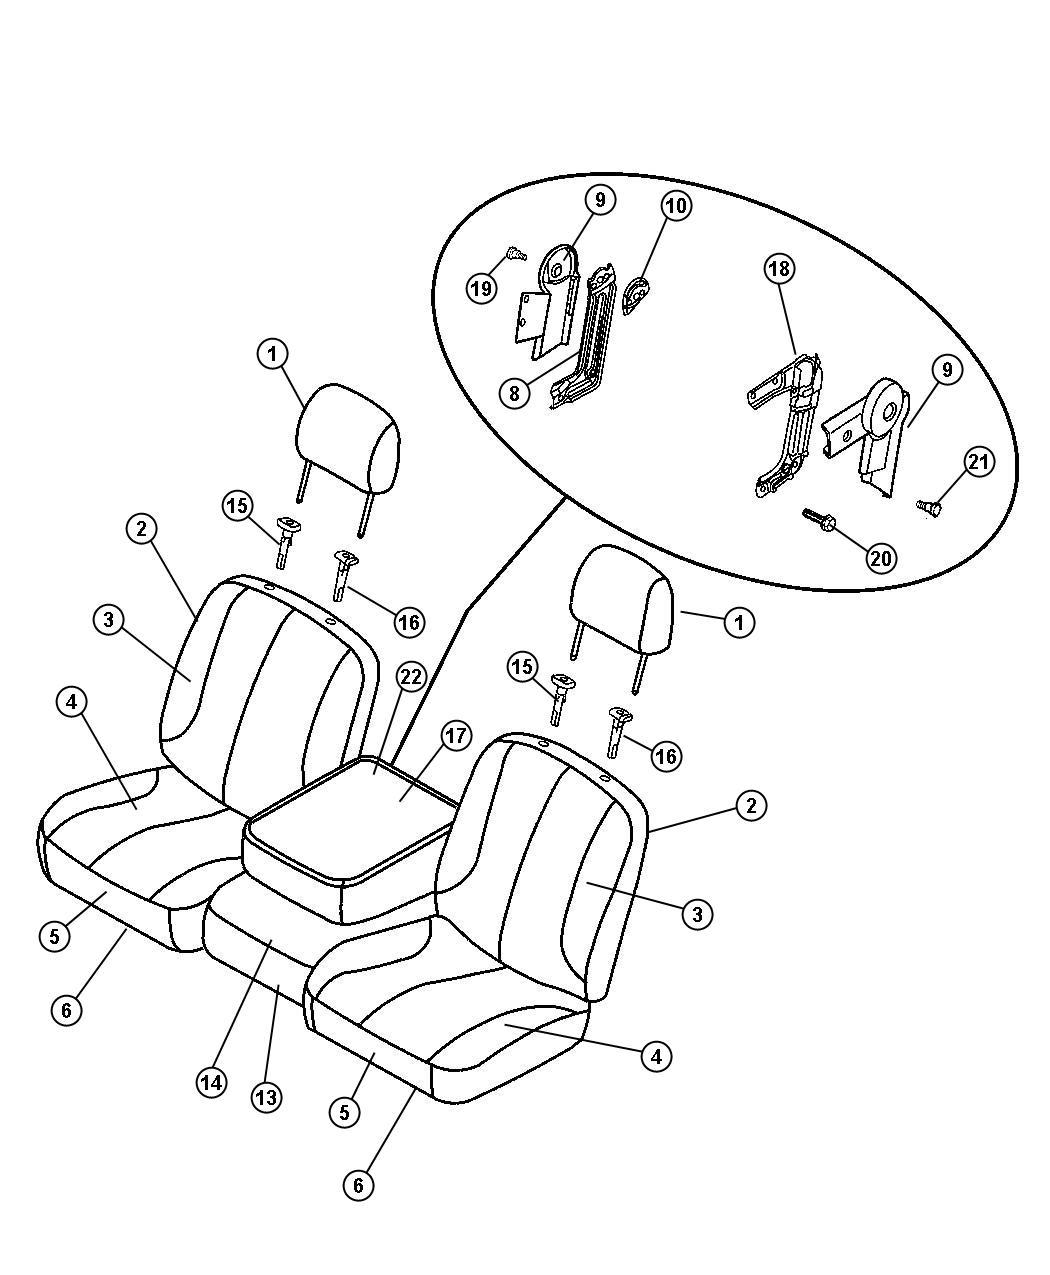 Dodge Ram Cover Front Seat Cushion Left D5 Trim